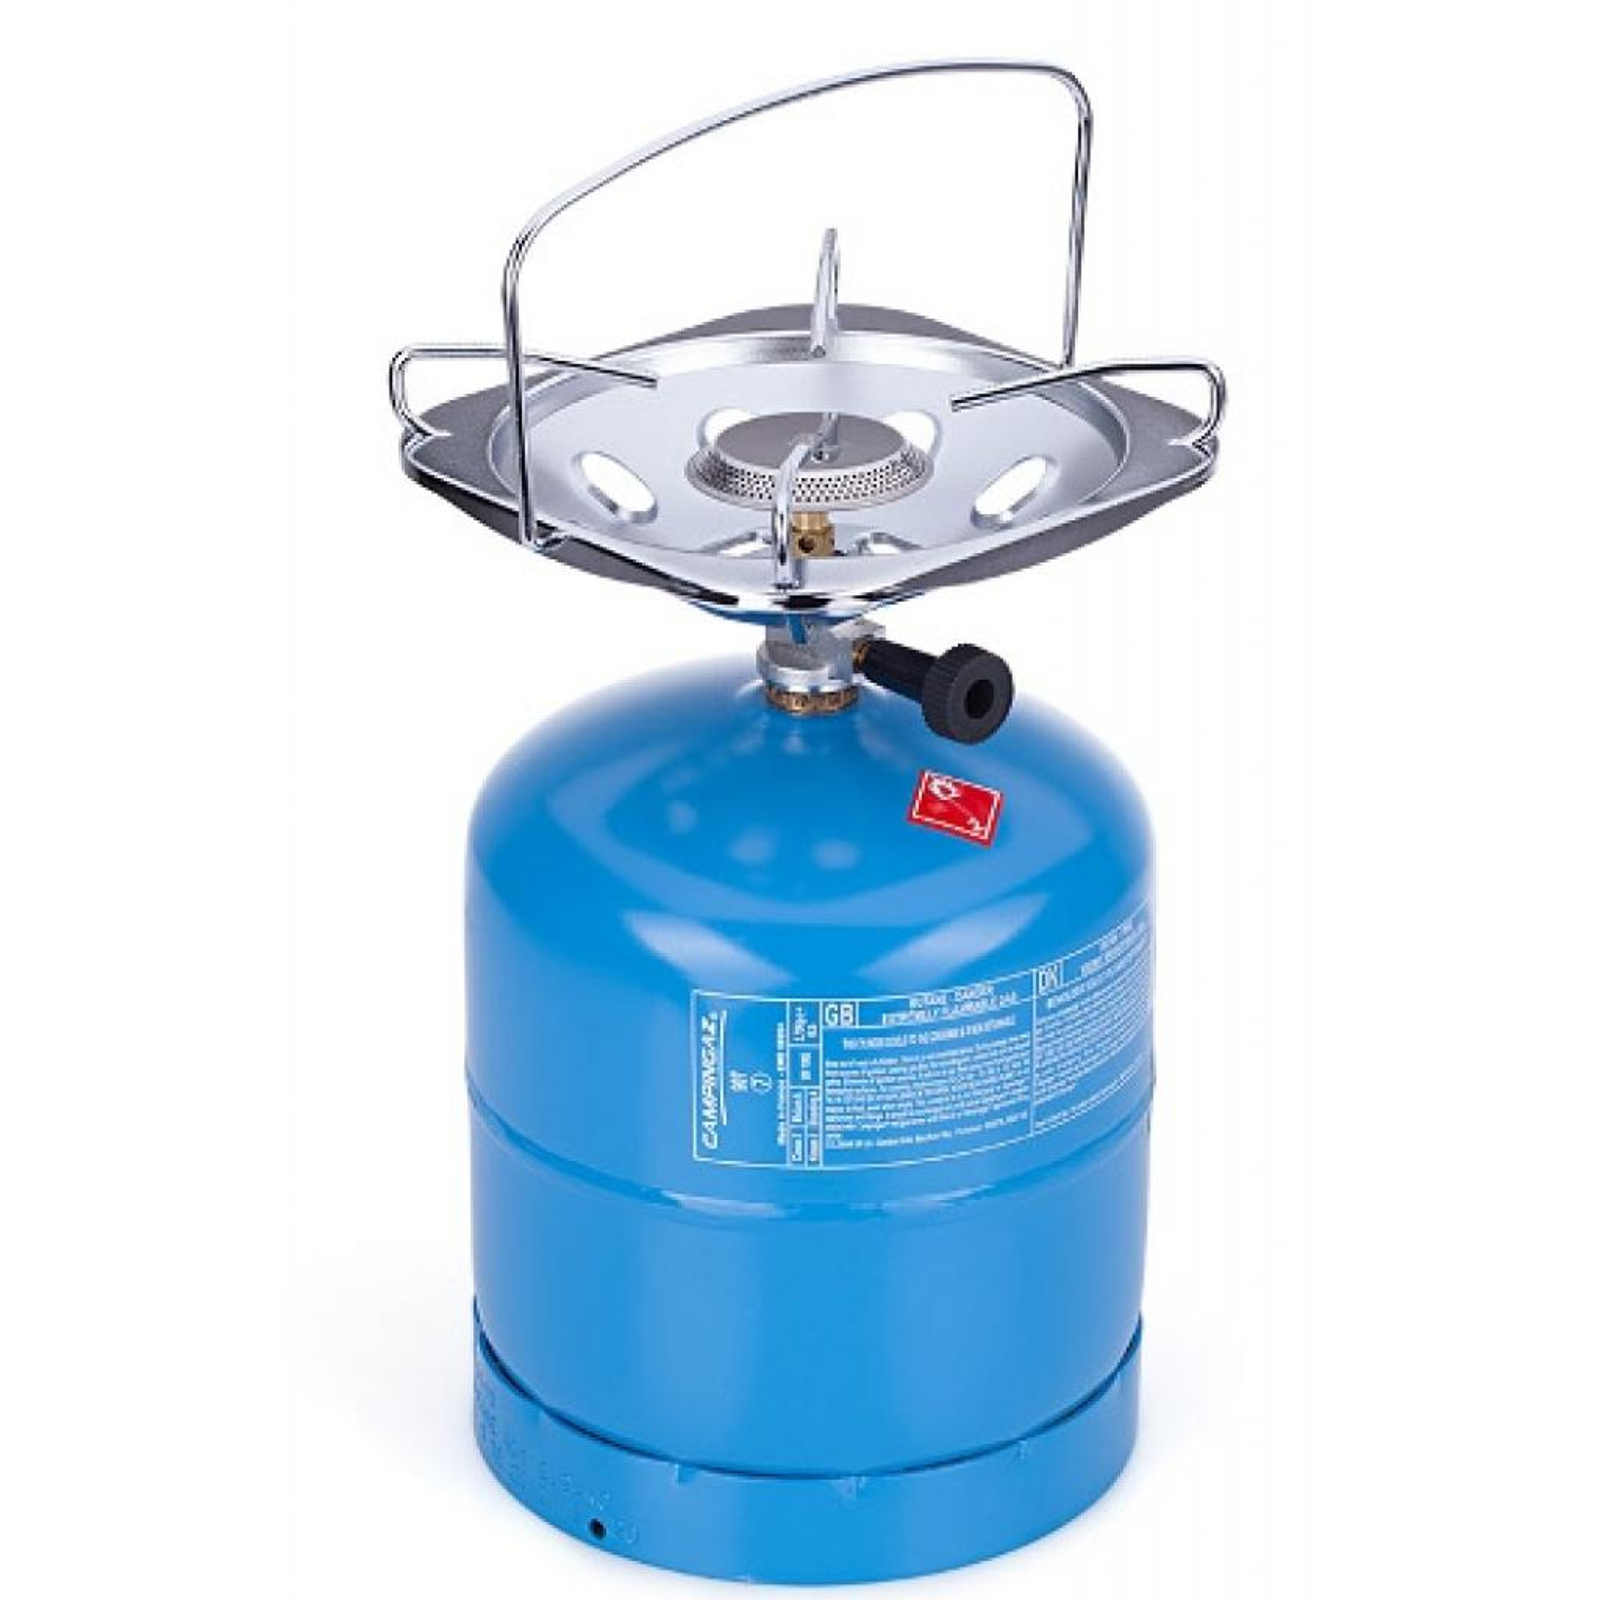 Газовая плитка Campingaz Super Carena Stove (4823082705566)